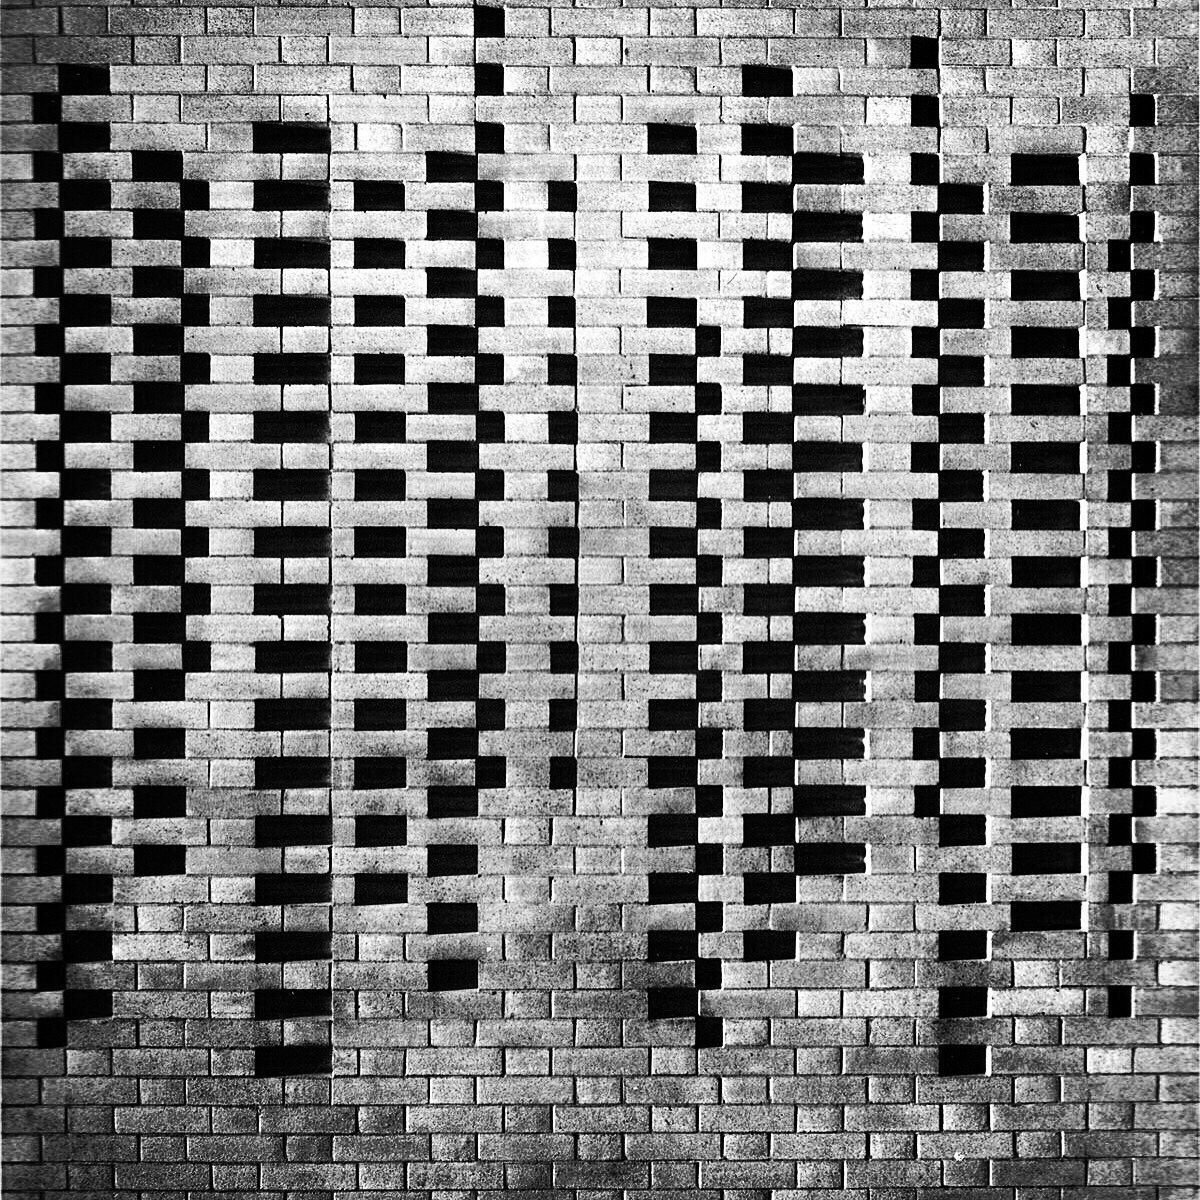 Pflegeheim innenarchitektur brick wall detail josefalbers harvard university cambridge